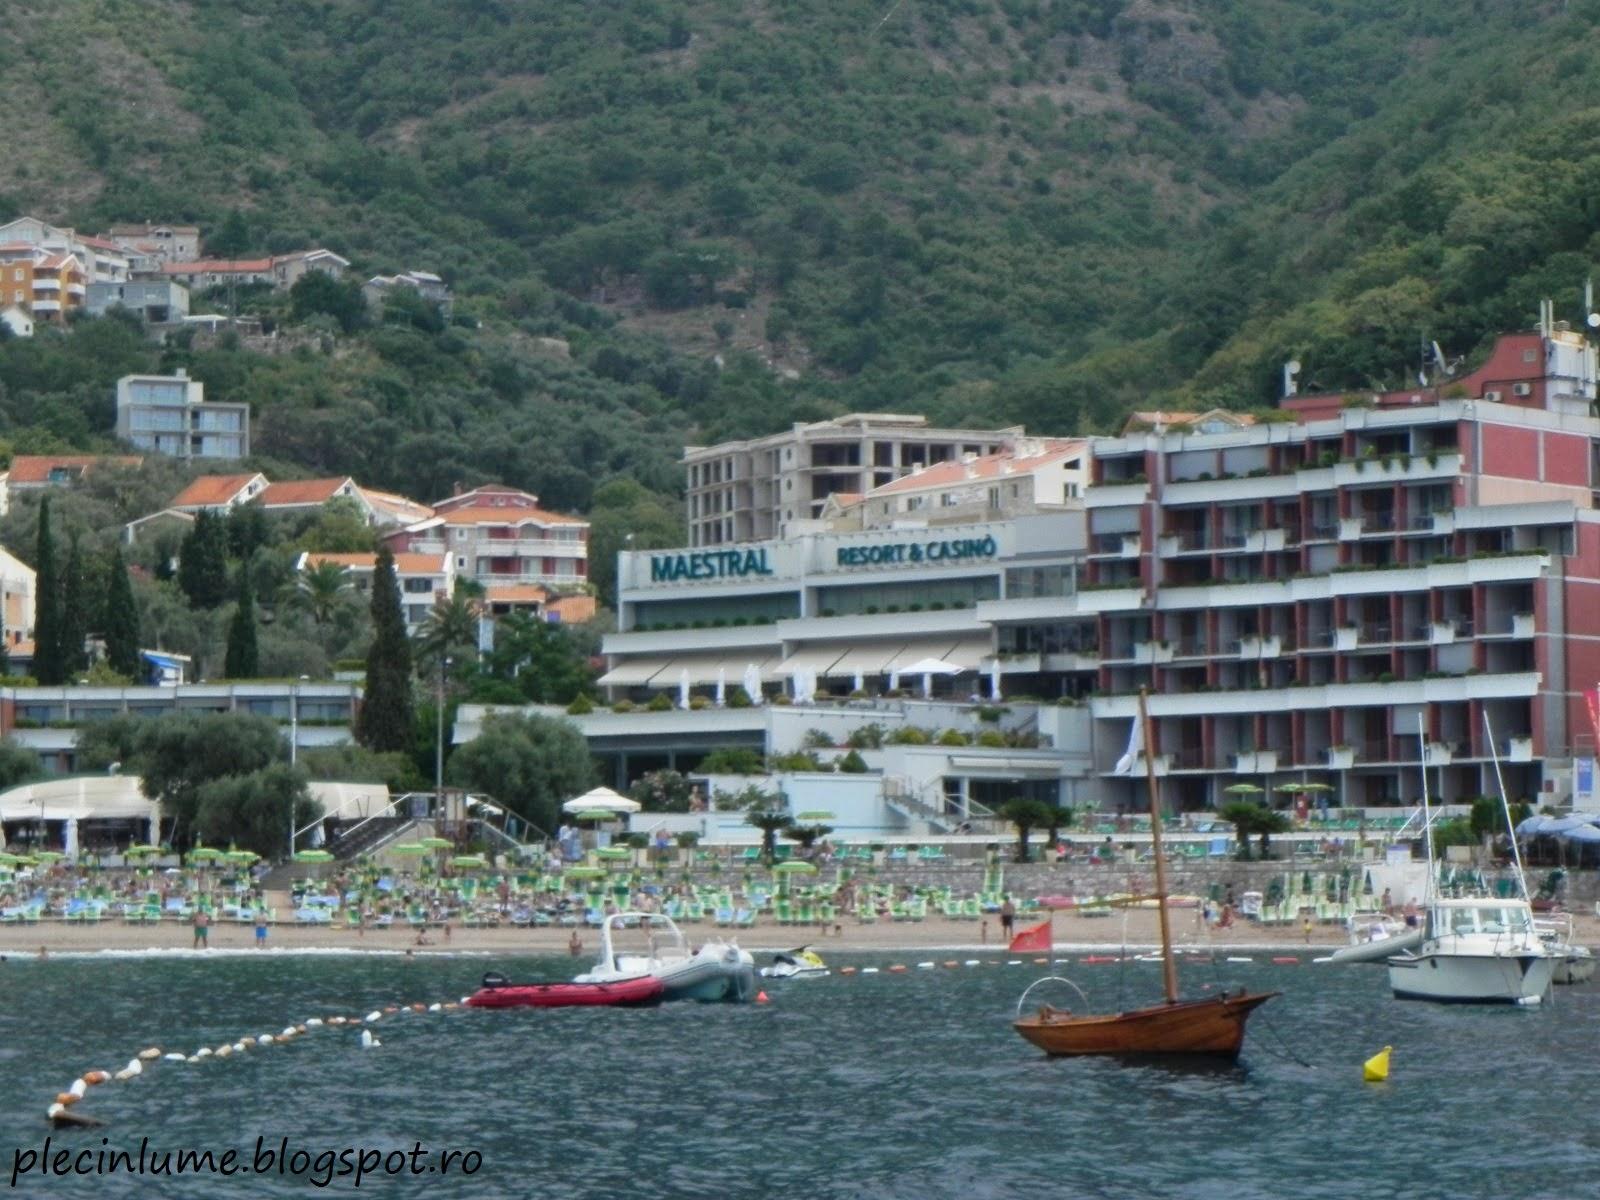 Hotel Maestral, Muntenegru